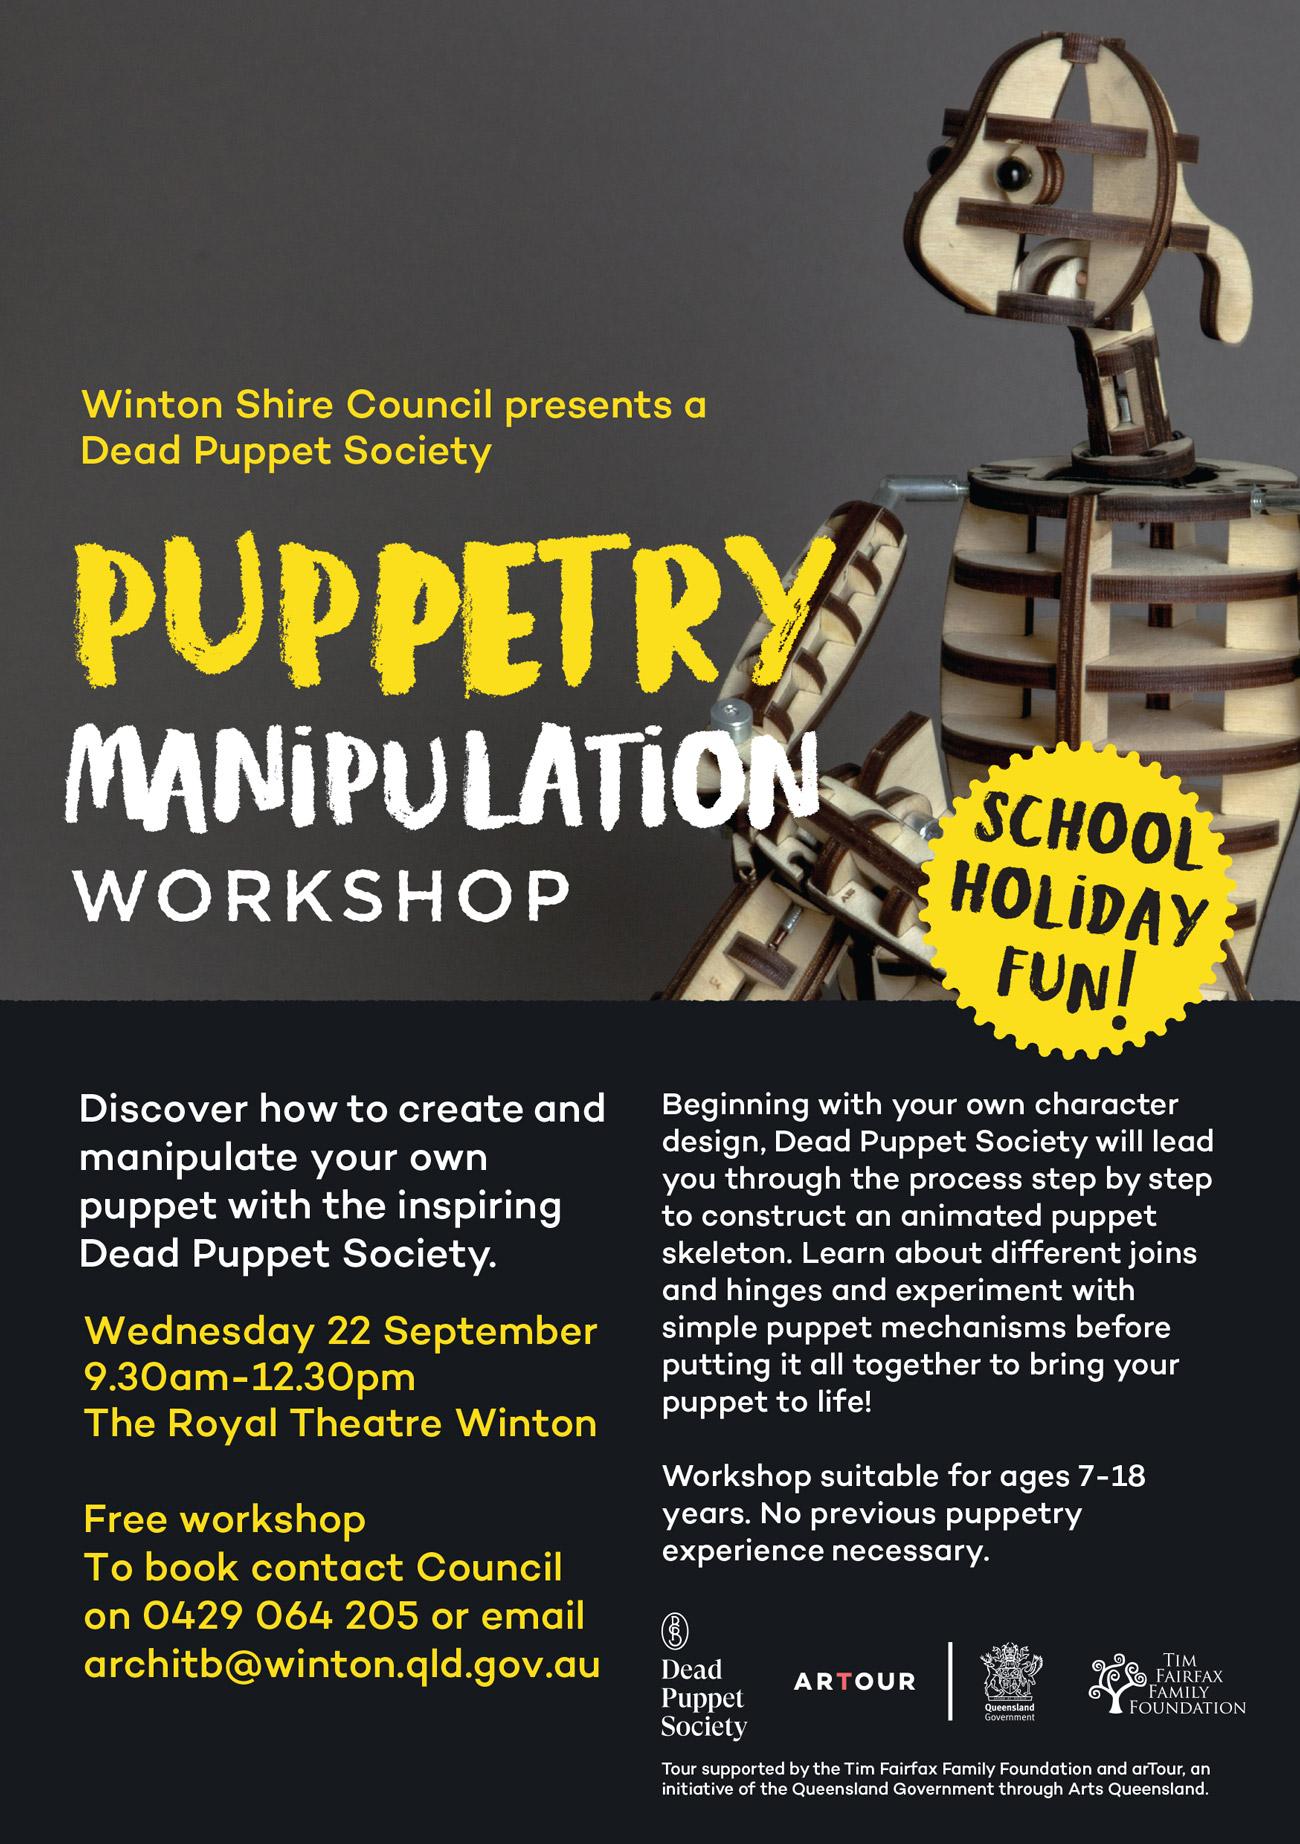 puppetry manipulation workshop